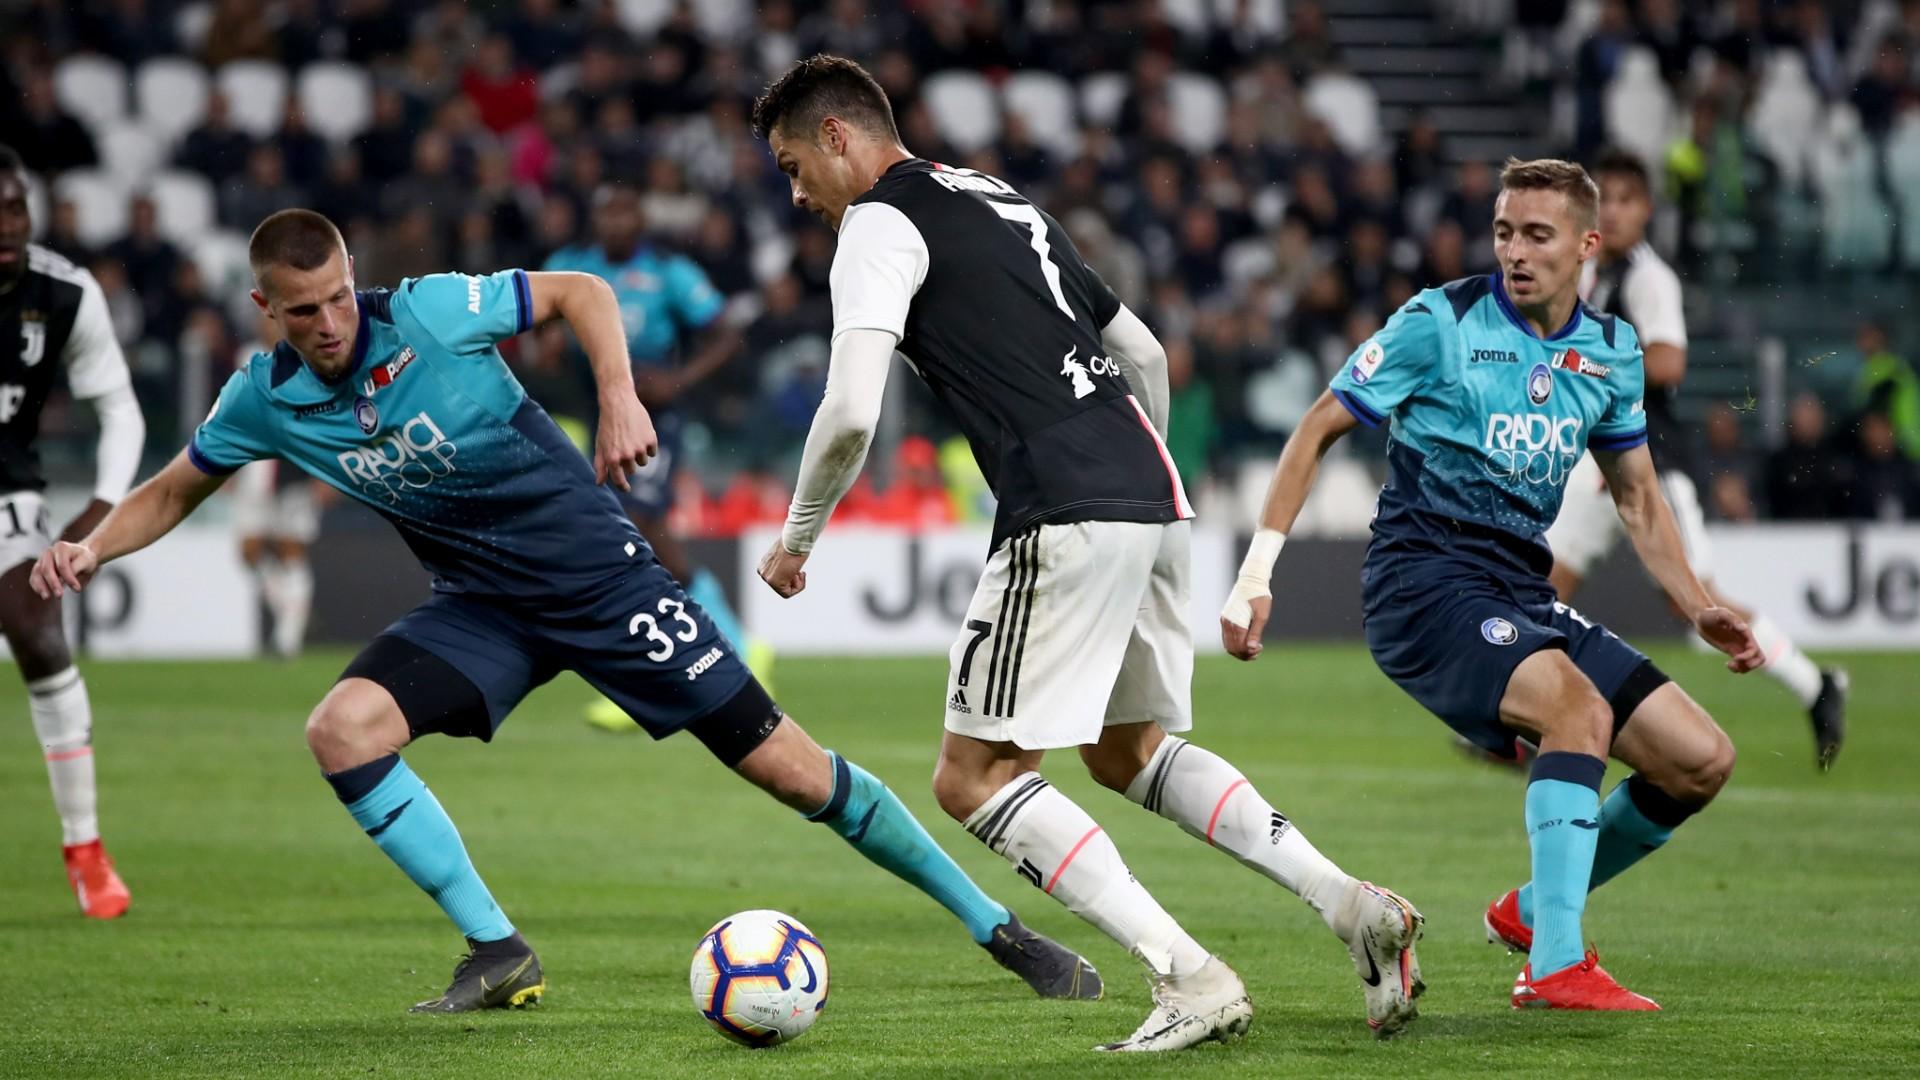 Juventus Atalanta 2019 cristiano ronaldo